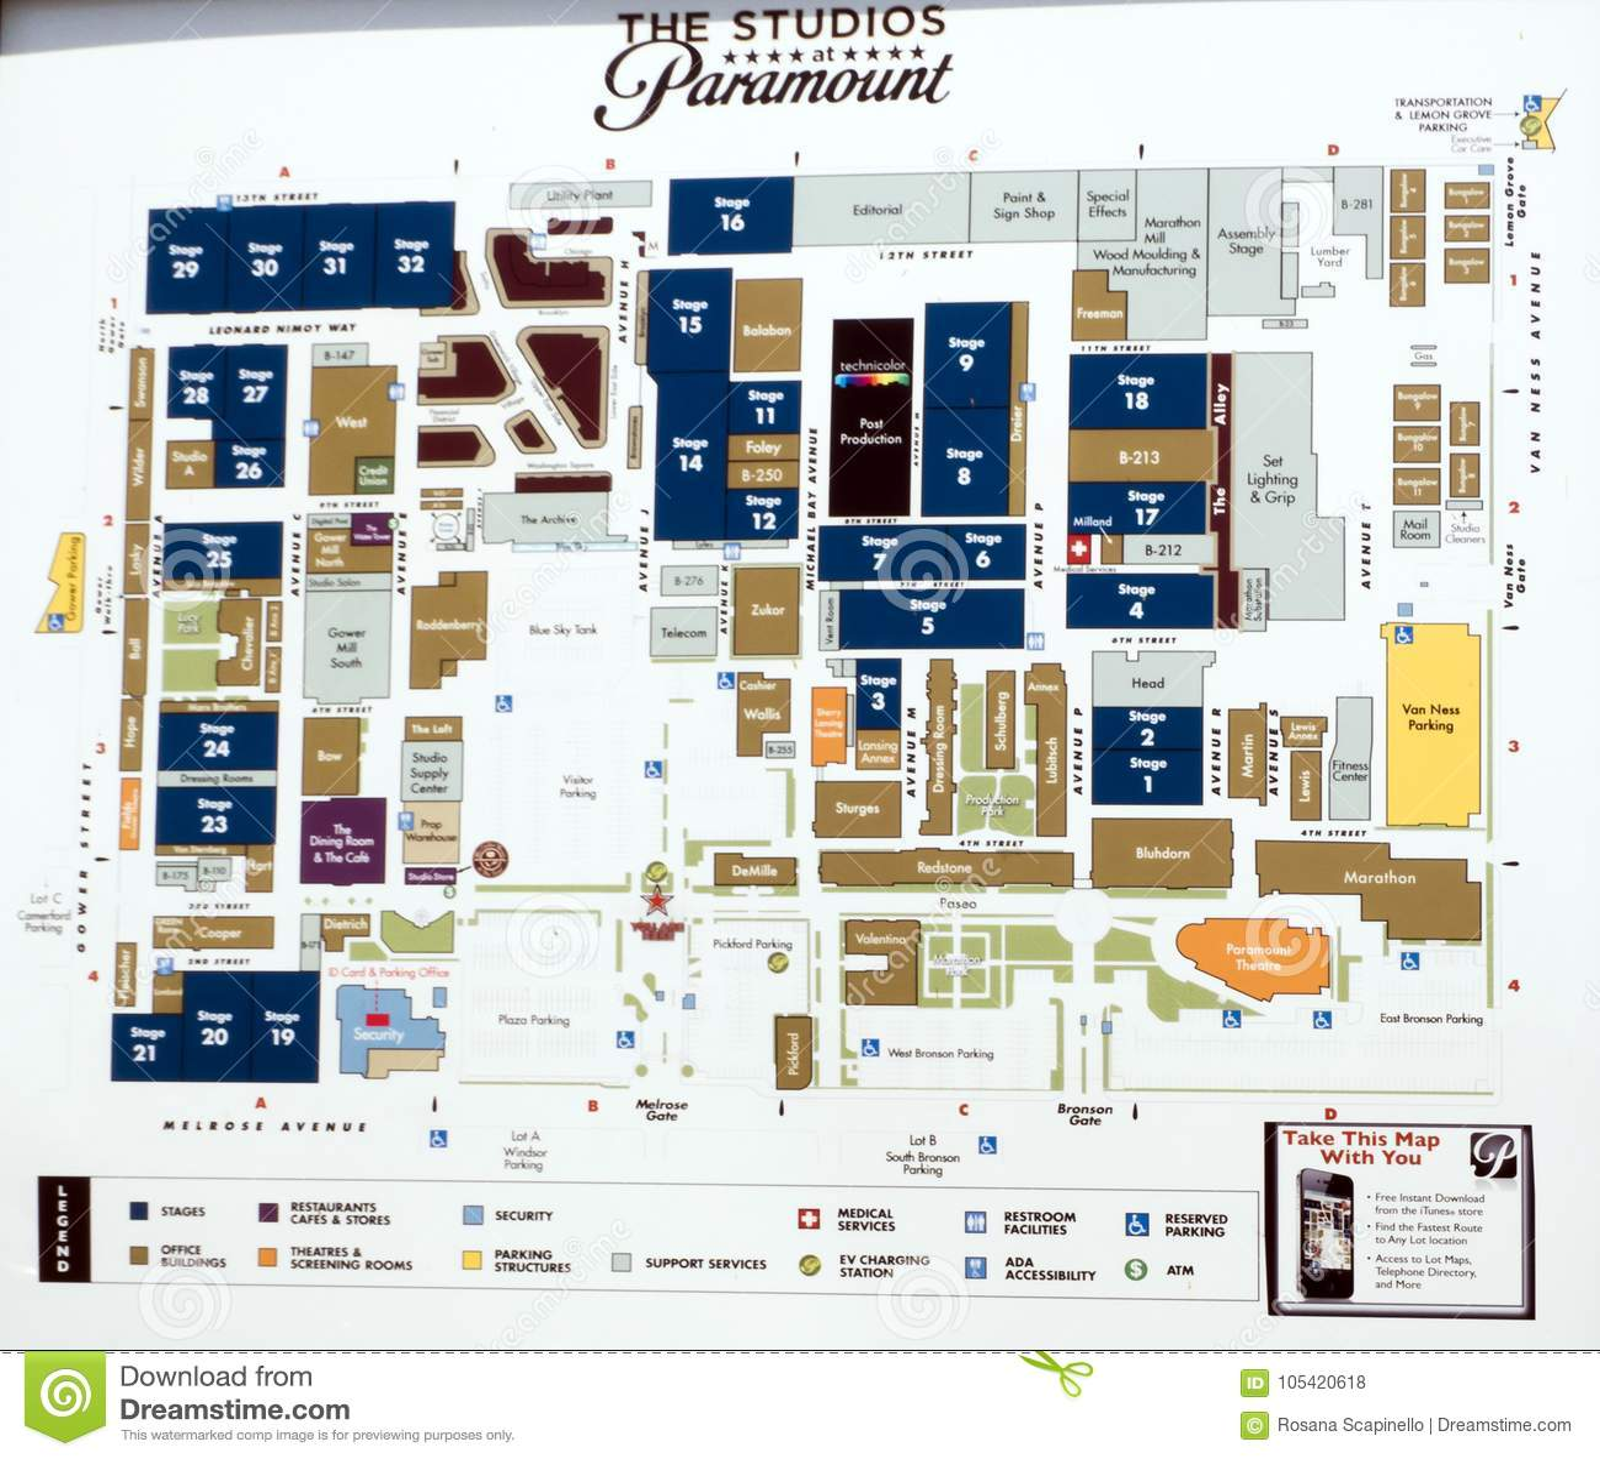 Map Of California Hollywood.Paramount Studios Map At Paramount Pictures Hollywood Tour On The